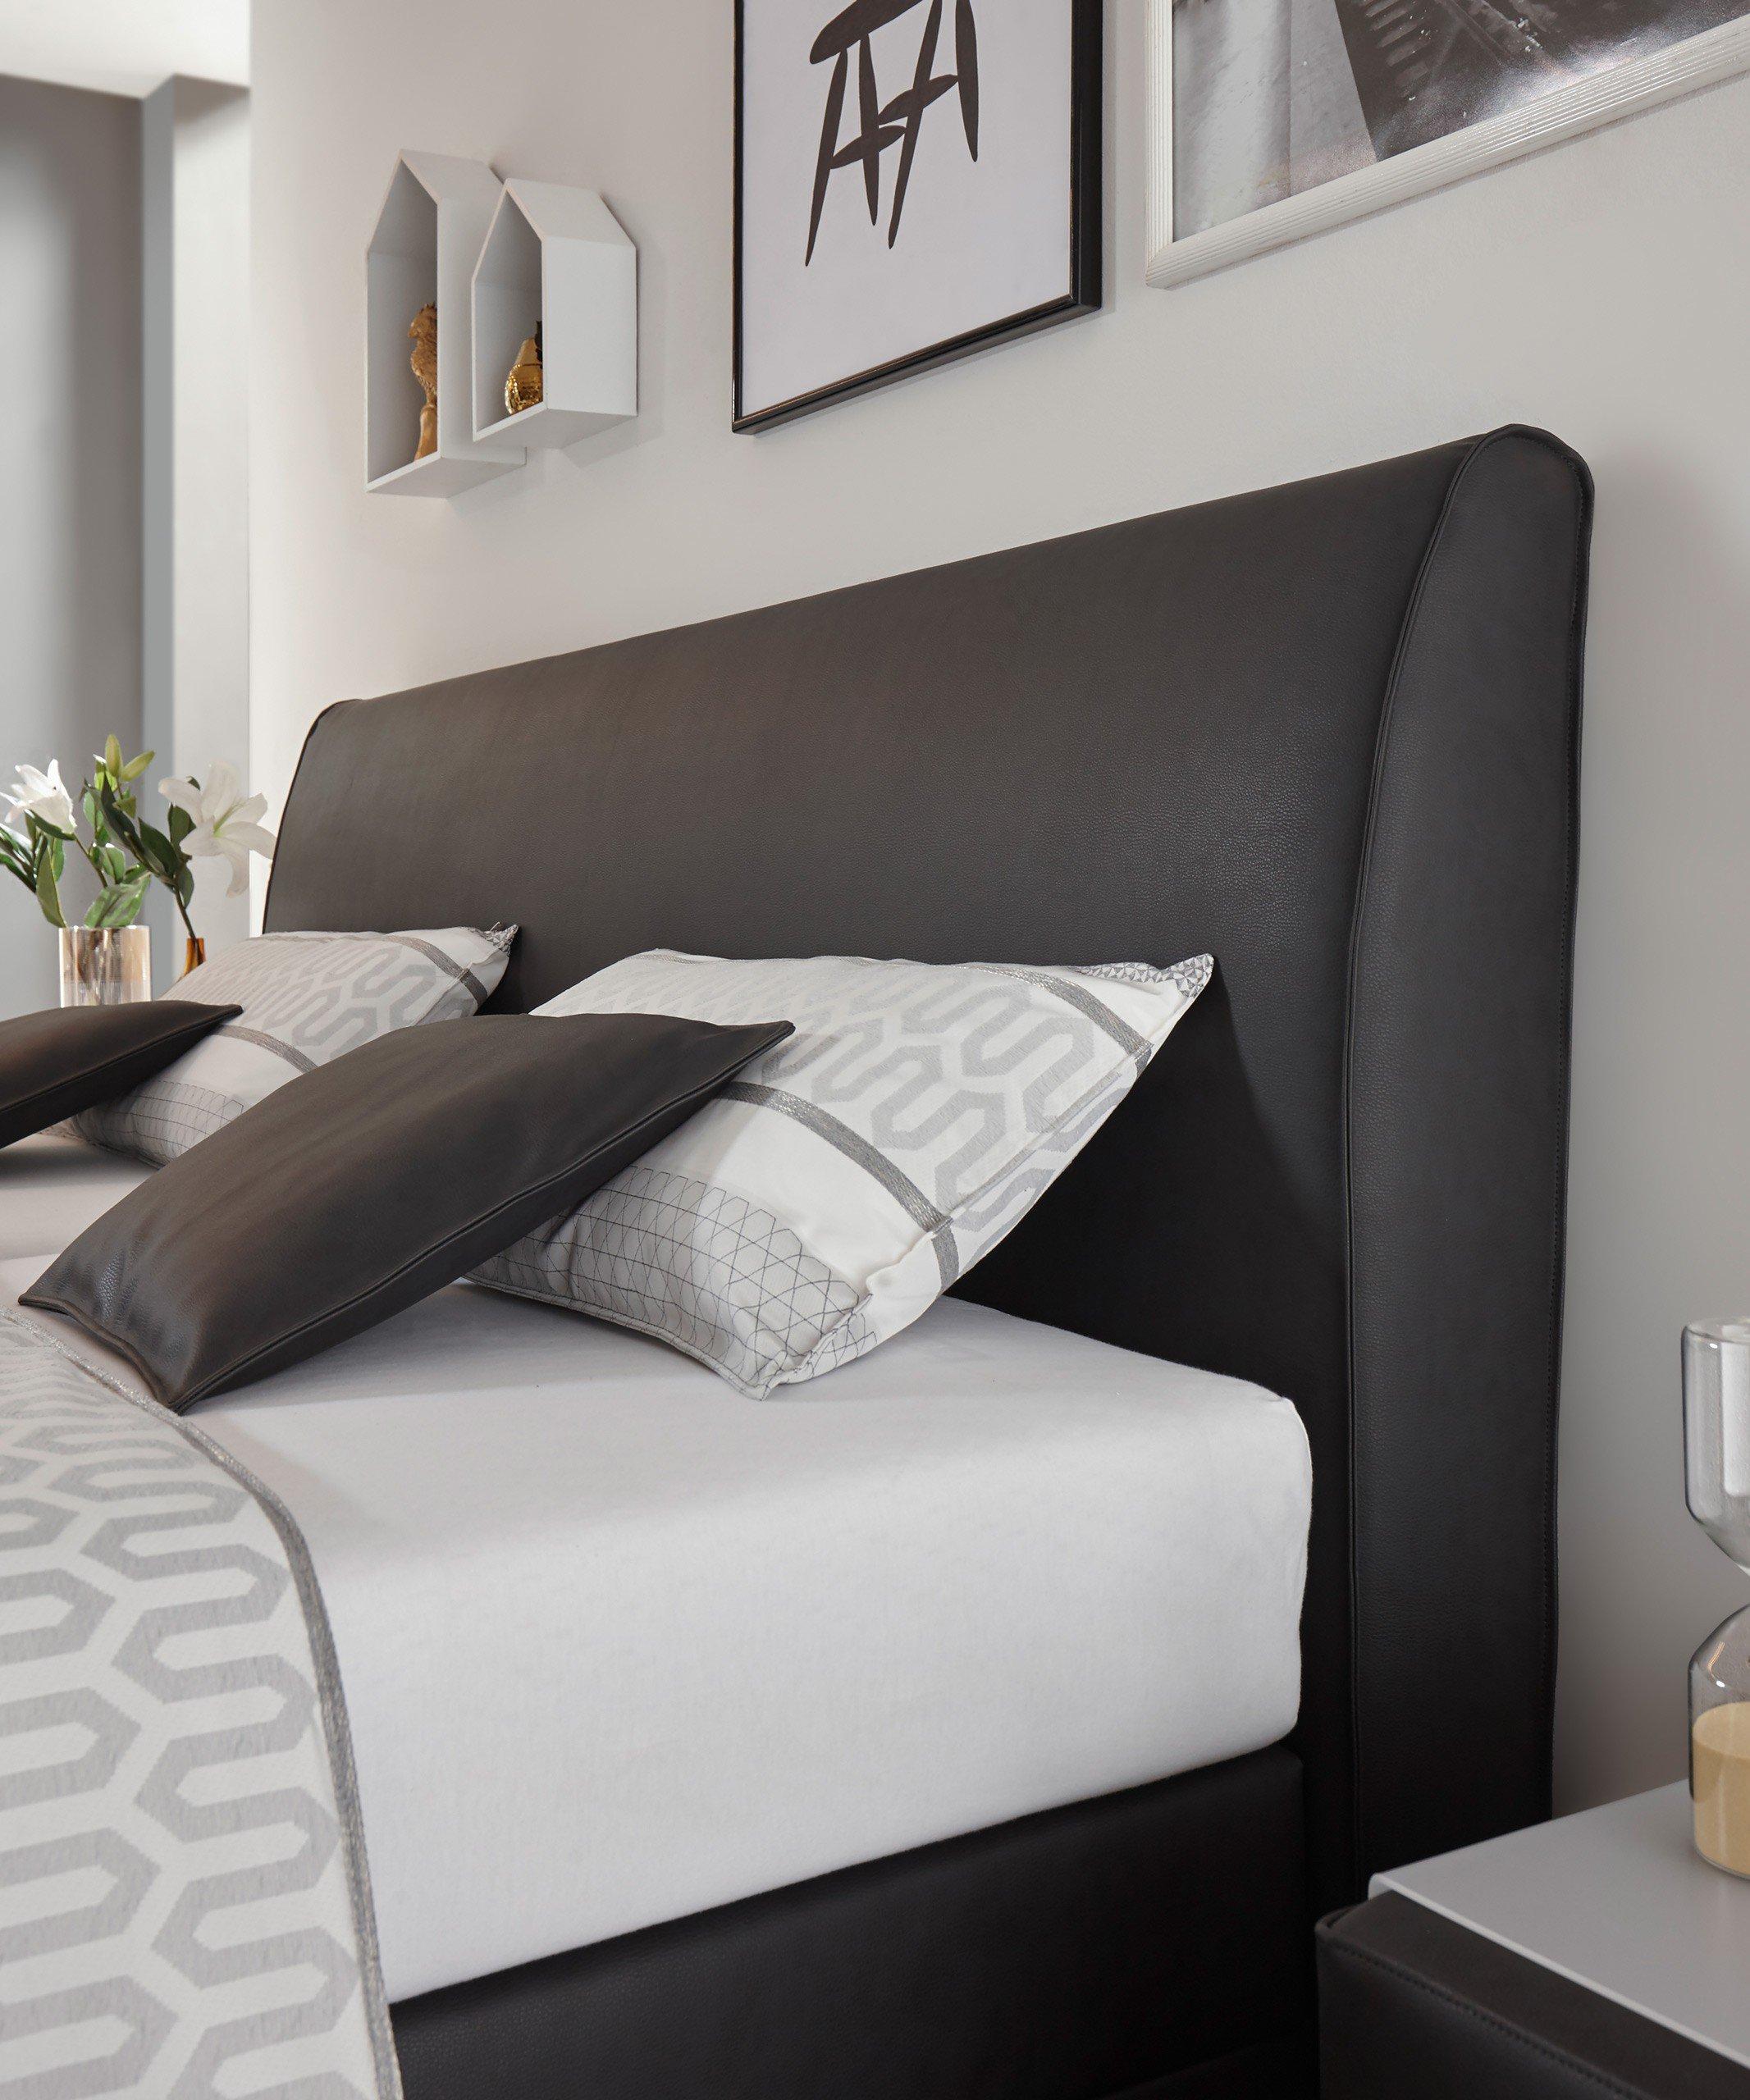 boxspringbett mercata anthrazit von ruf motorisch m bel. Black Bedroom Furniture Sets. Home Design Ideas